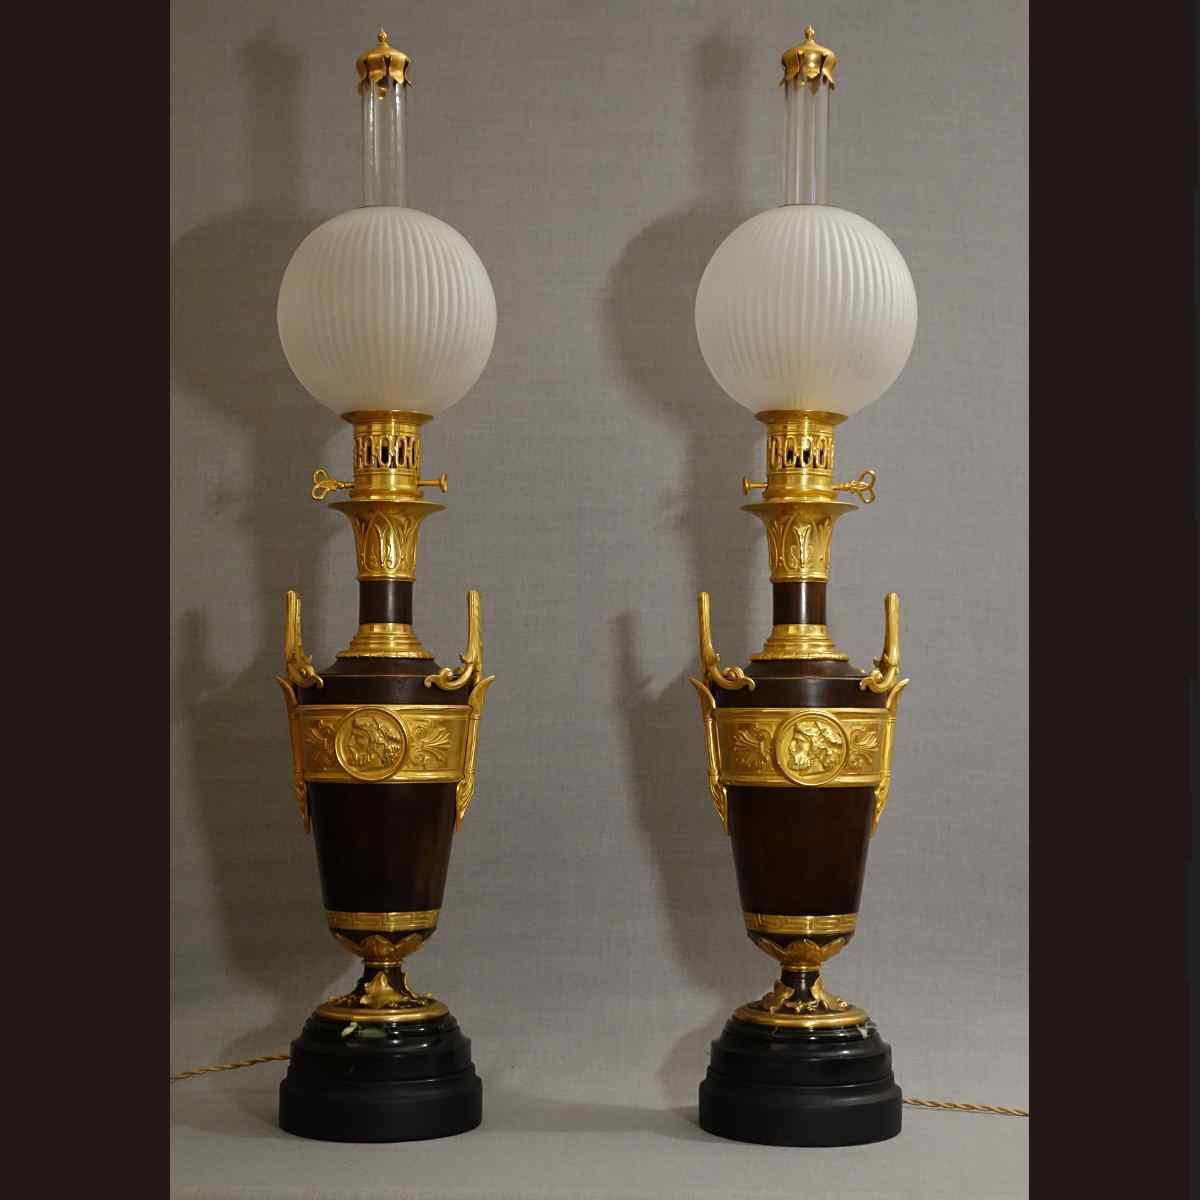 Pair of Large Lamps XIXth